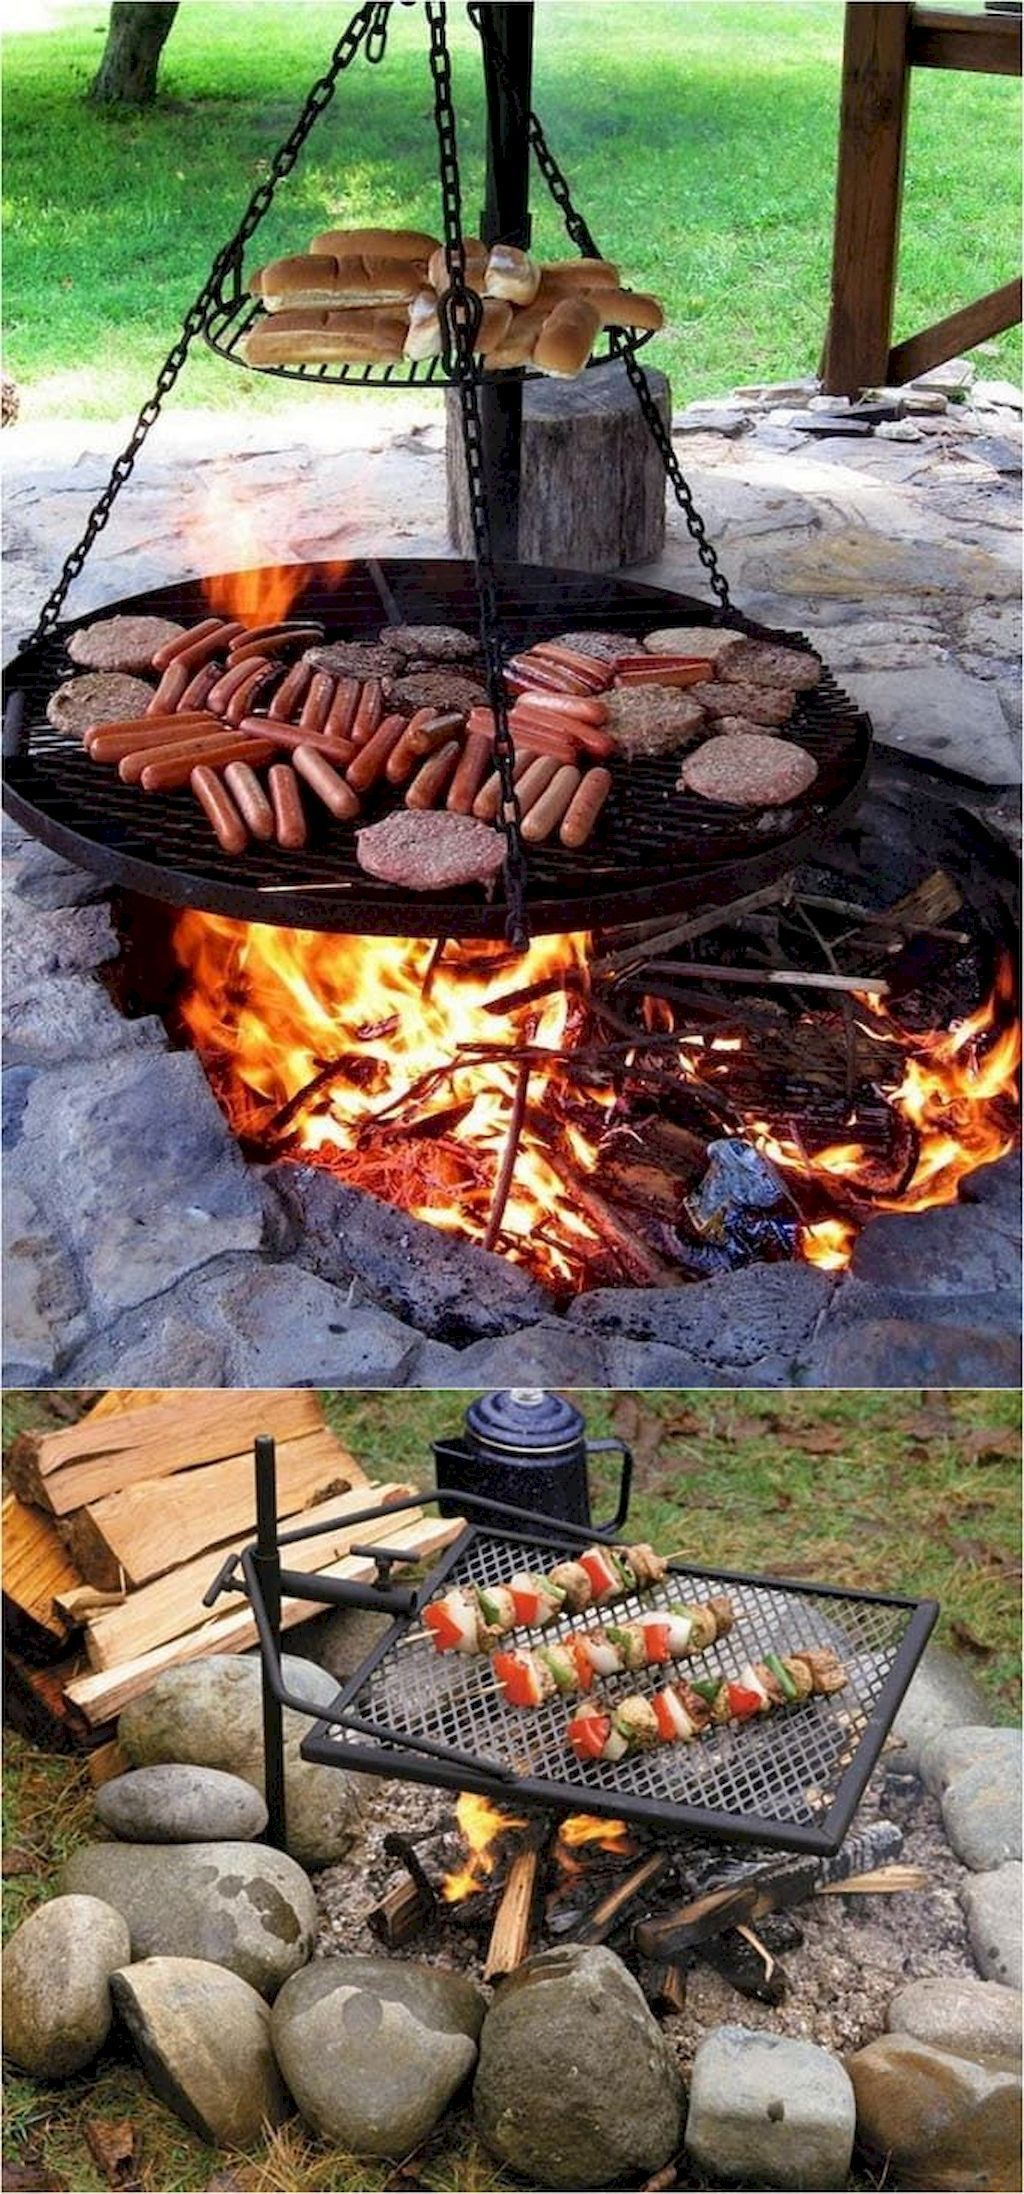 Best Fire Pit Design Ideas For Backyard Fire Pit Decor Cool